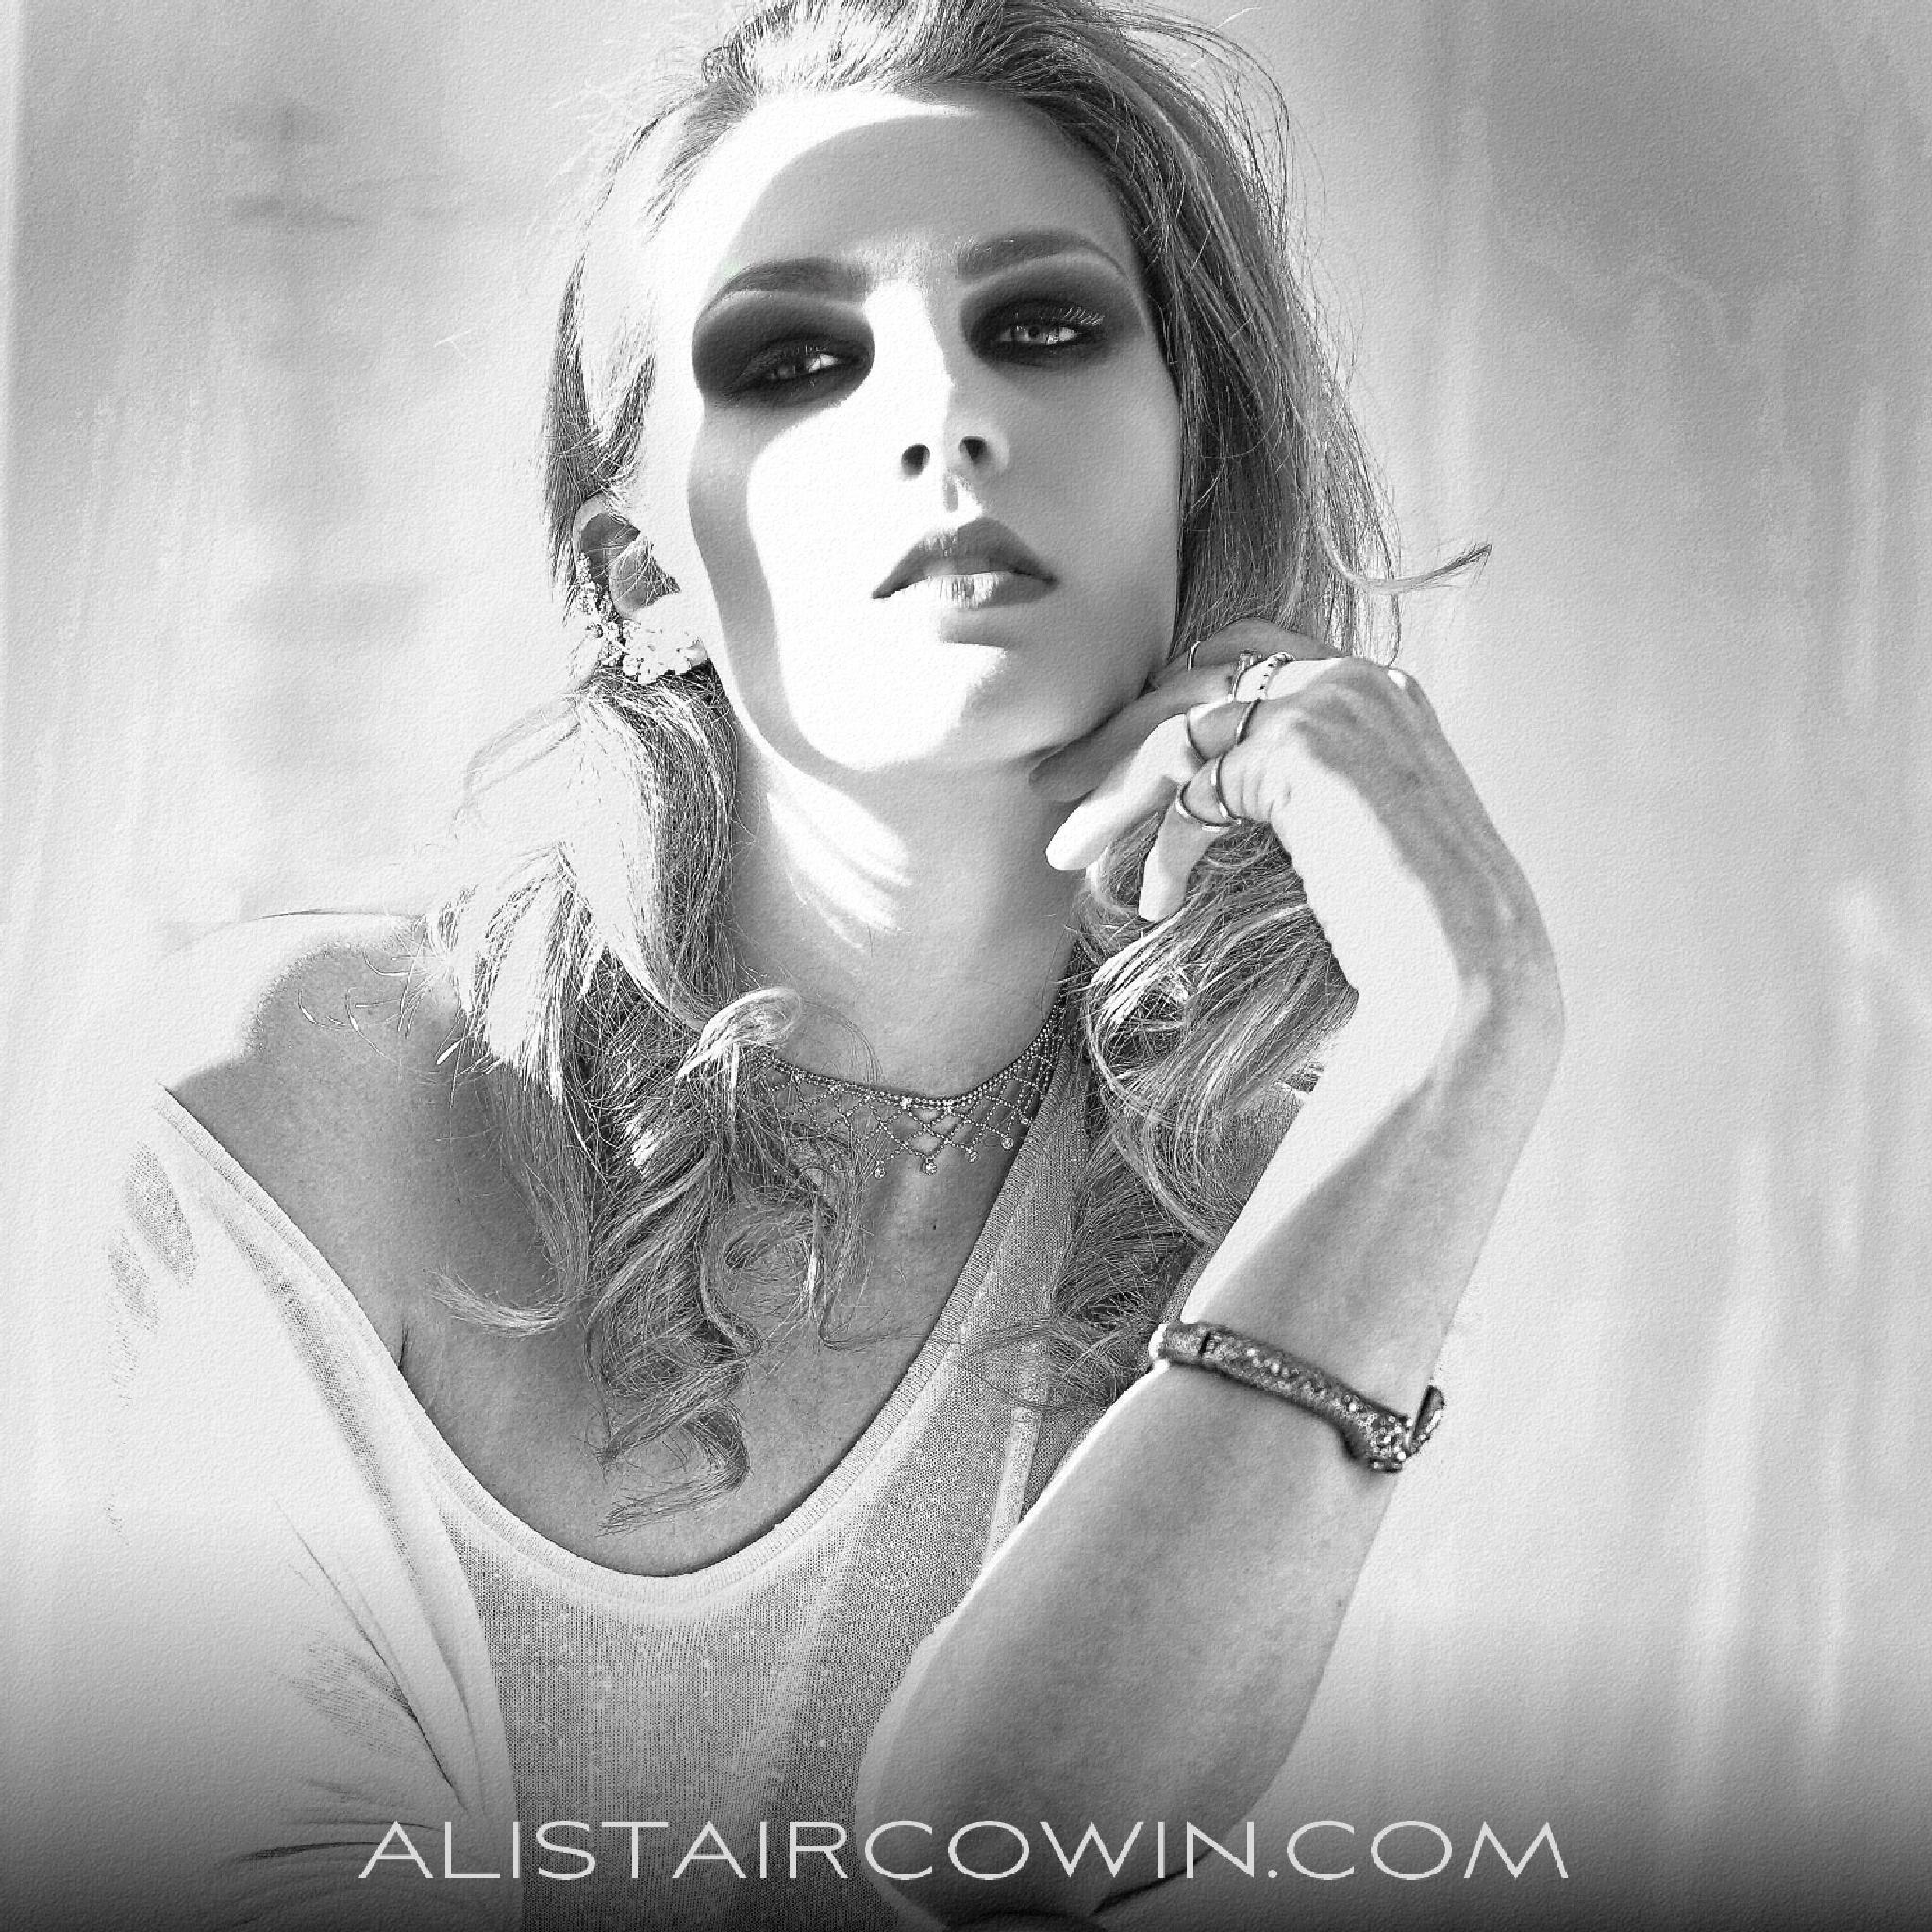 Amalia by Alistair Cowin